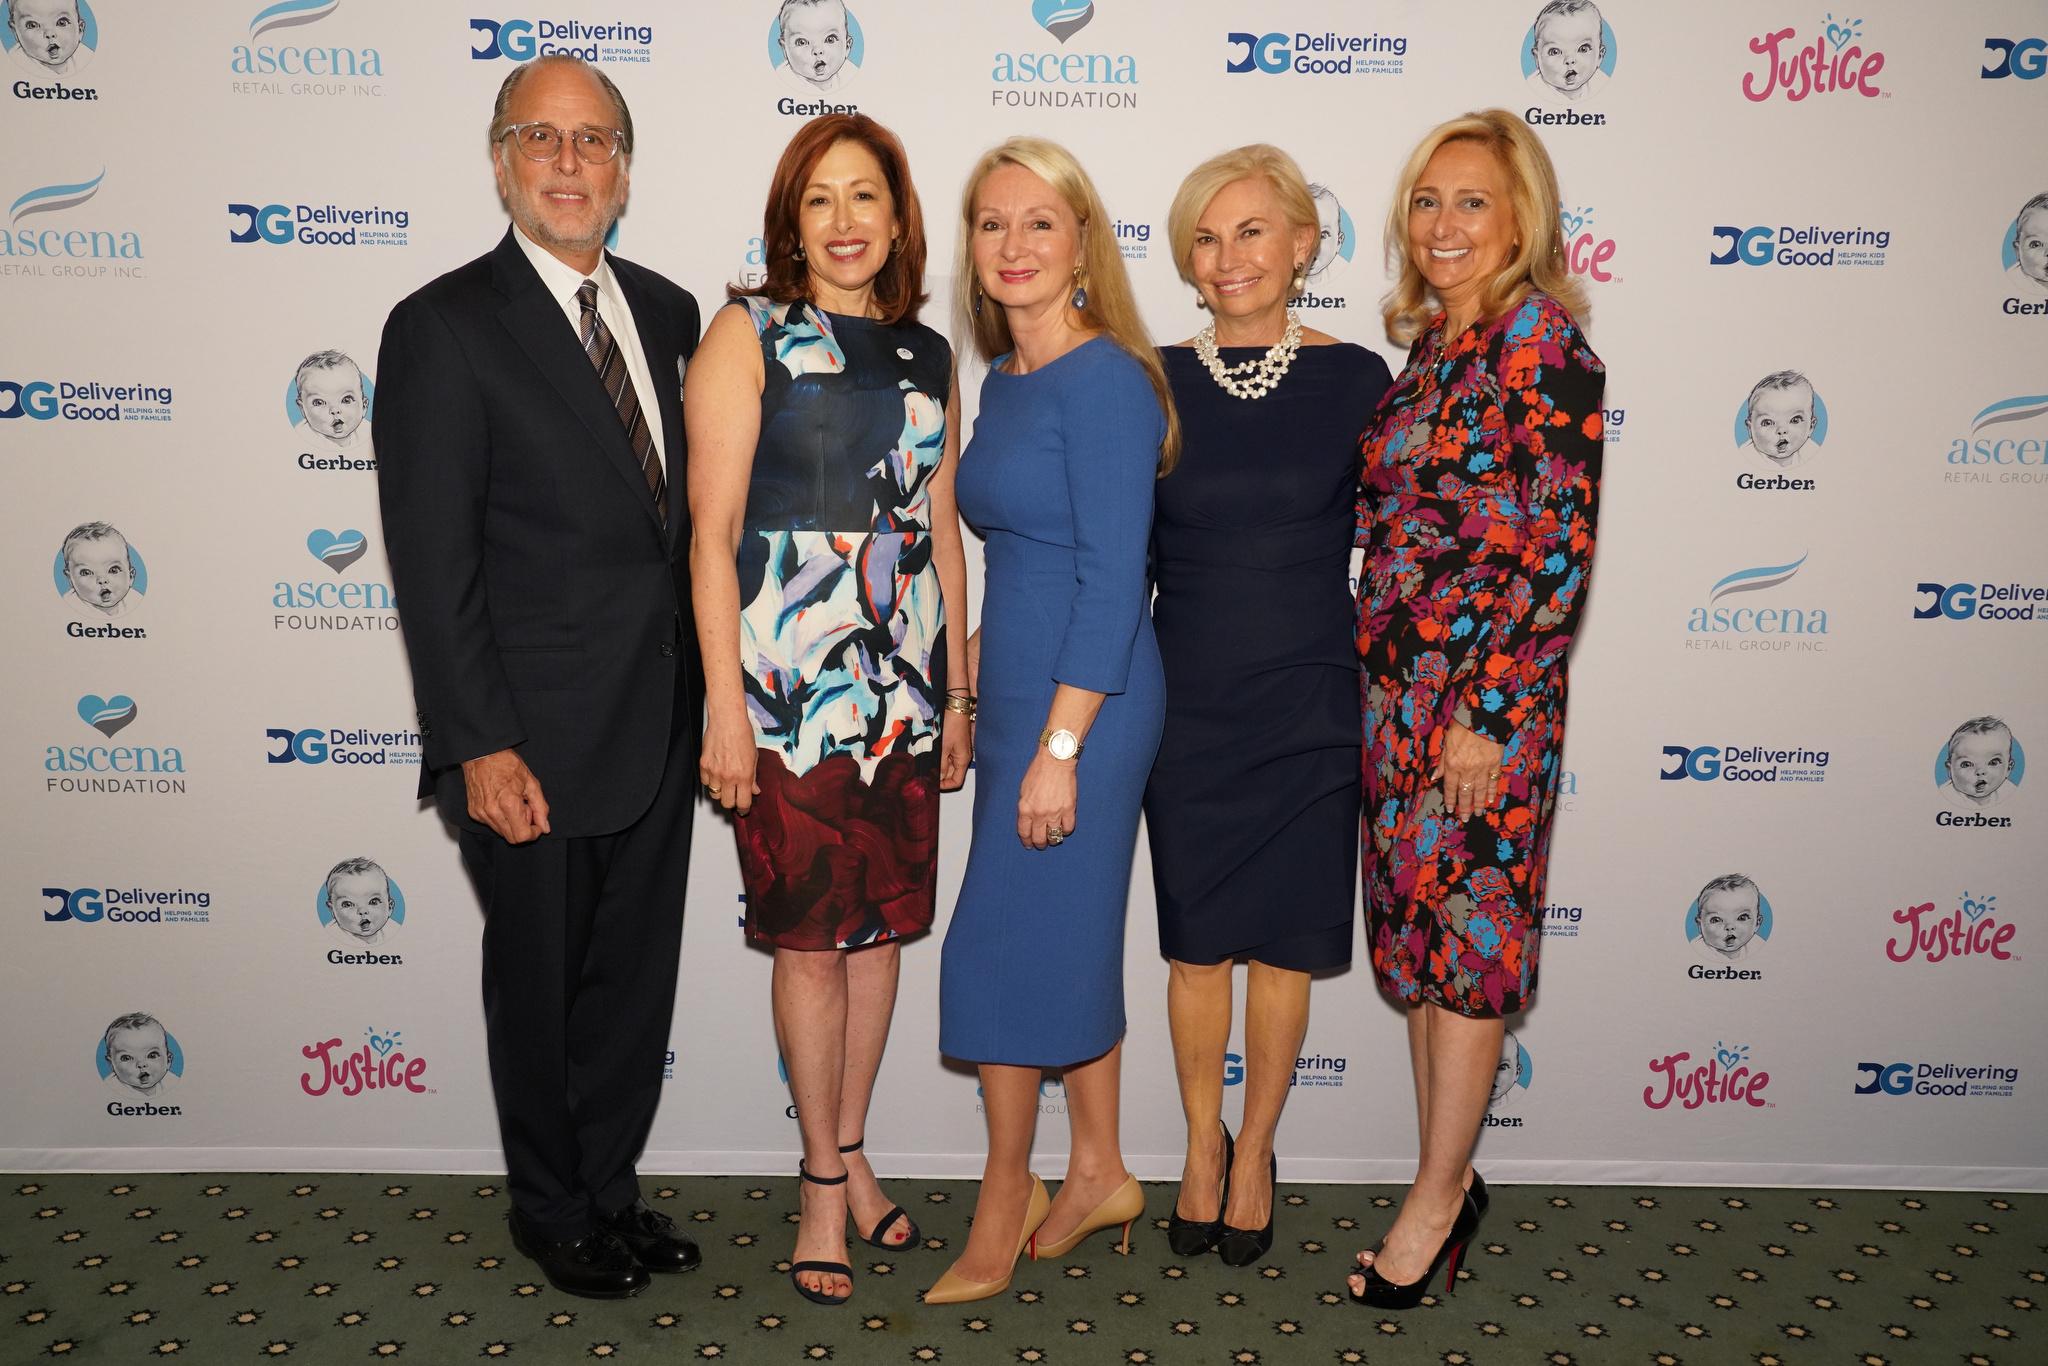 Allan Ellinger, Lisa Gurwitch, Andrea Weiss, Karen Bromley and Carole Postale.